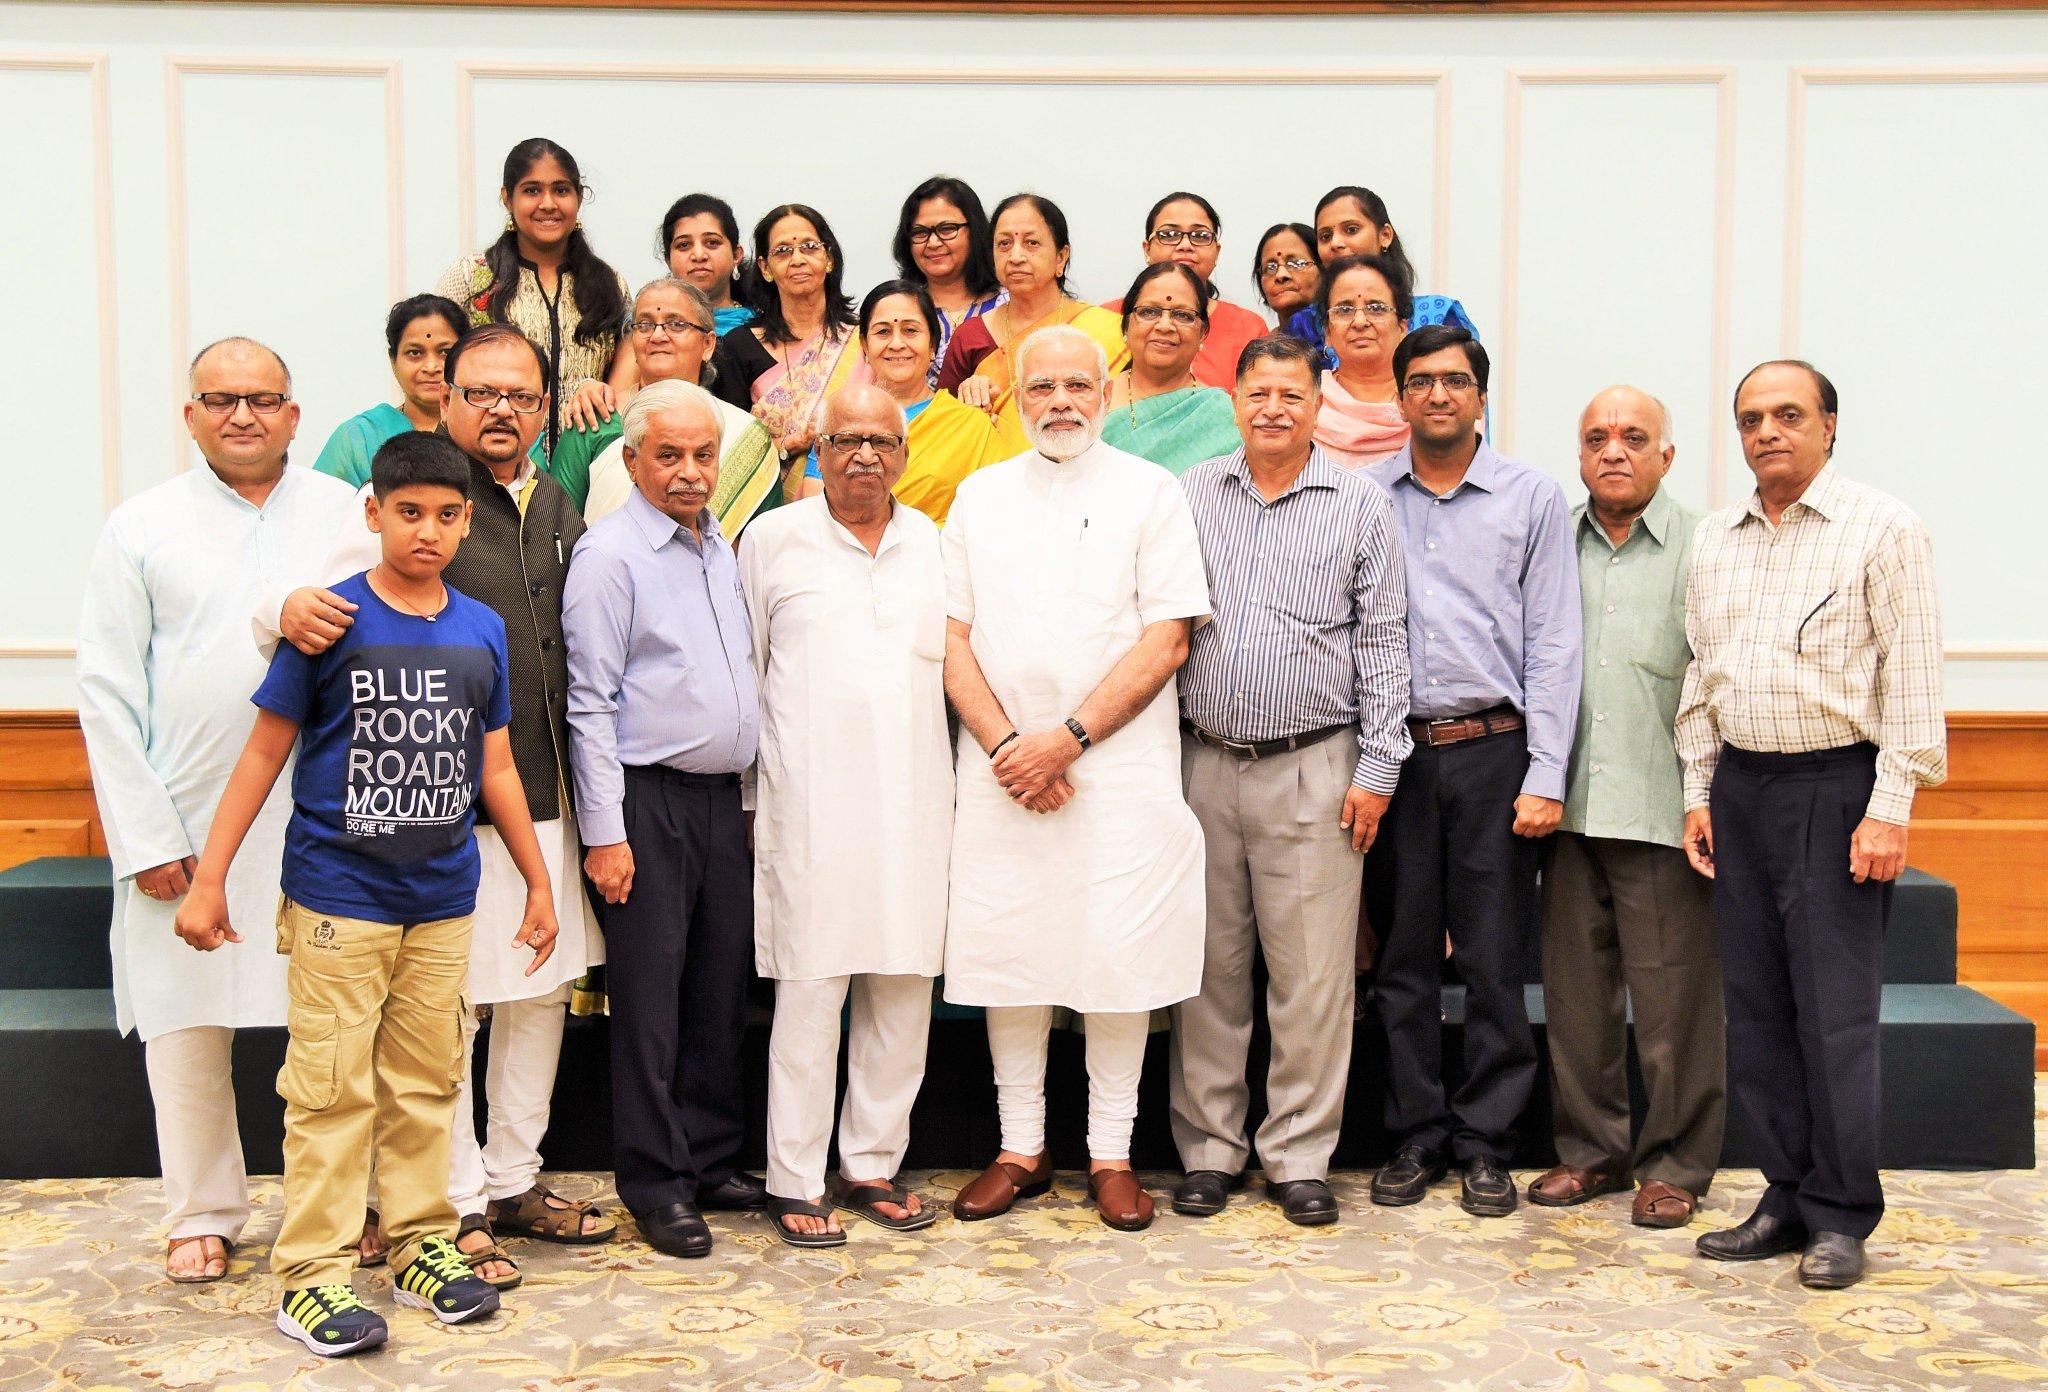 Met the family members of Shri Laxmanrao Inamdar. https://t.co/xjRcwCkREt